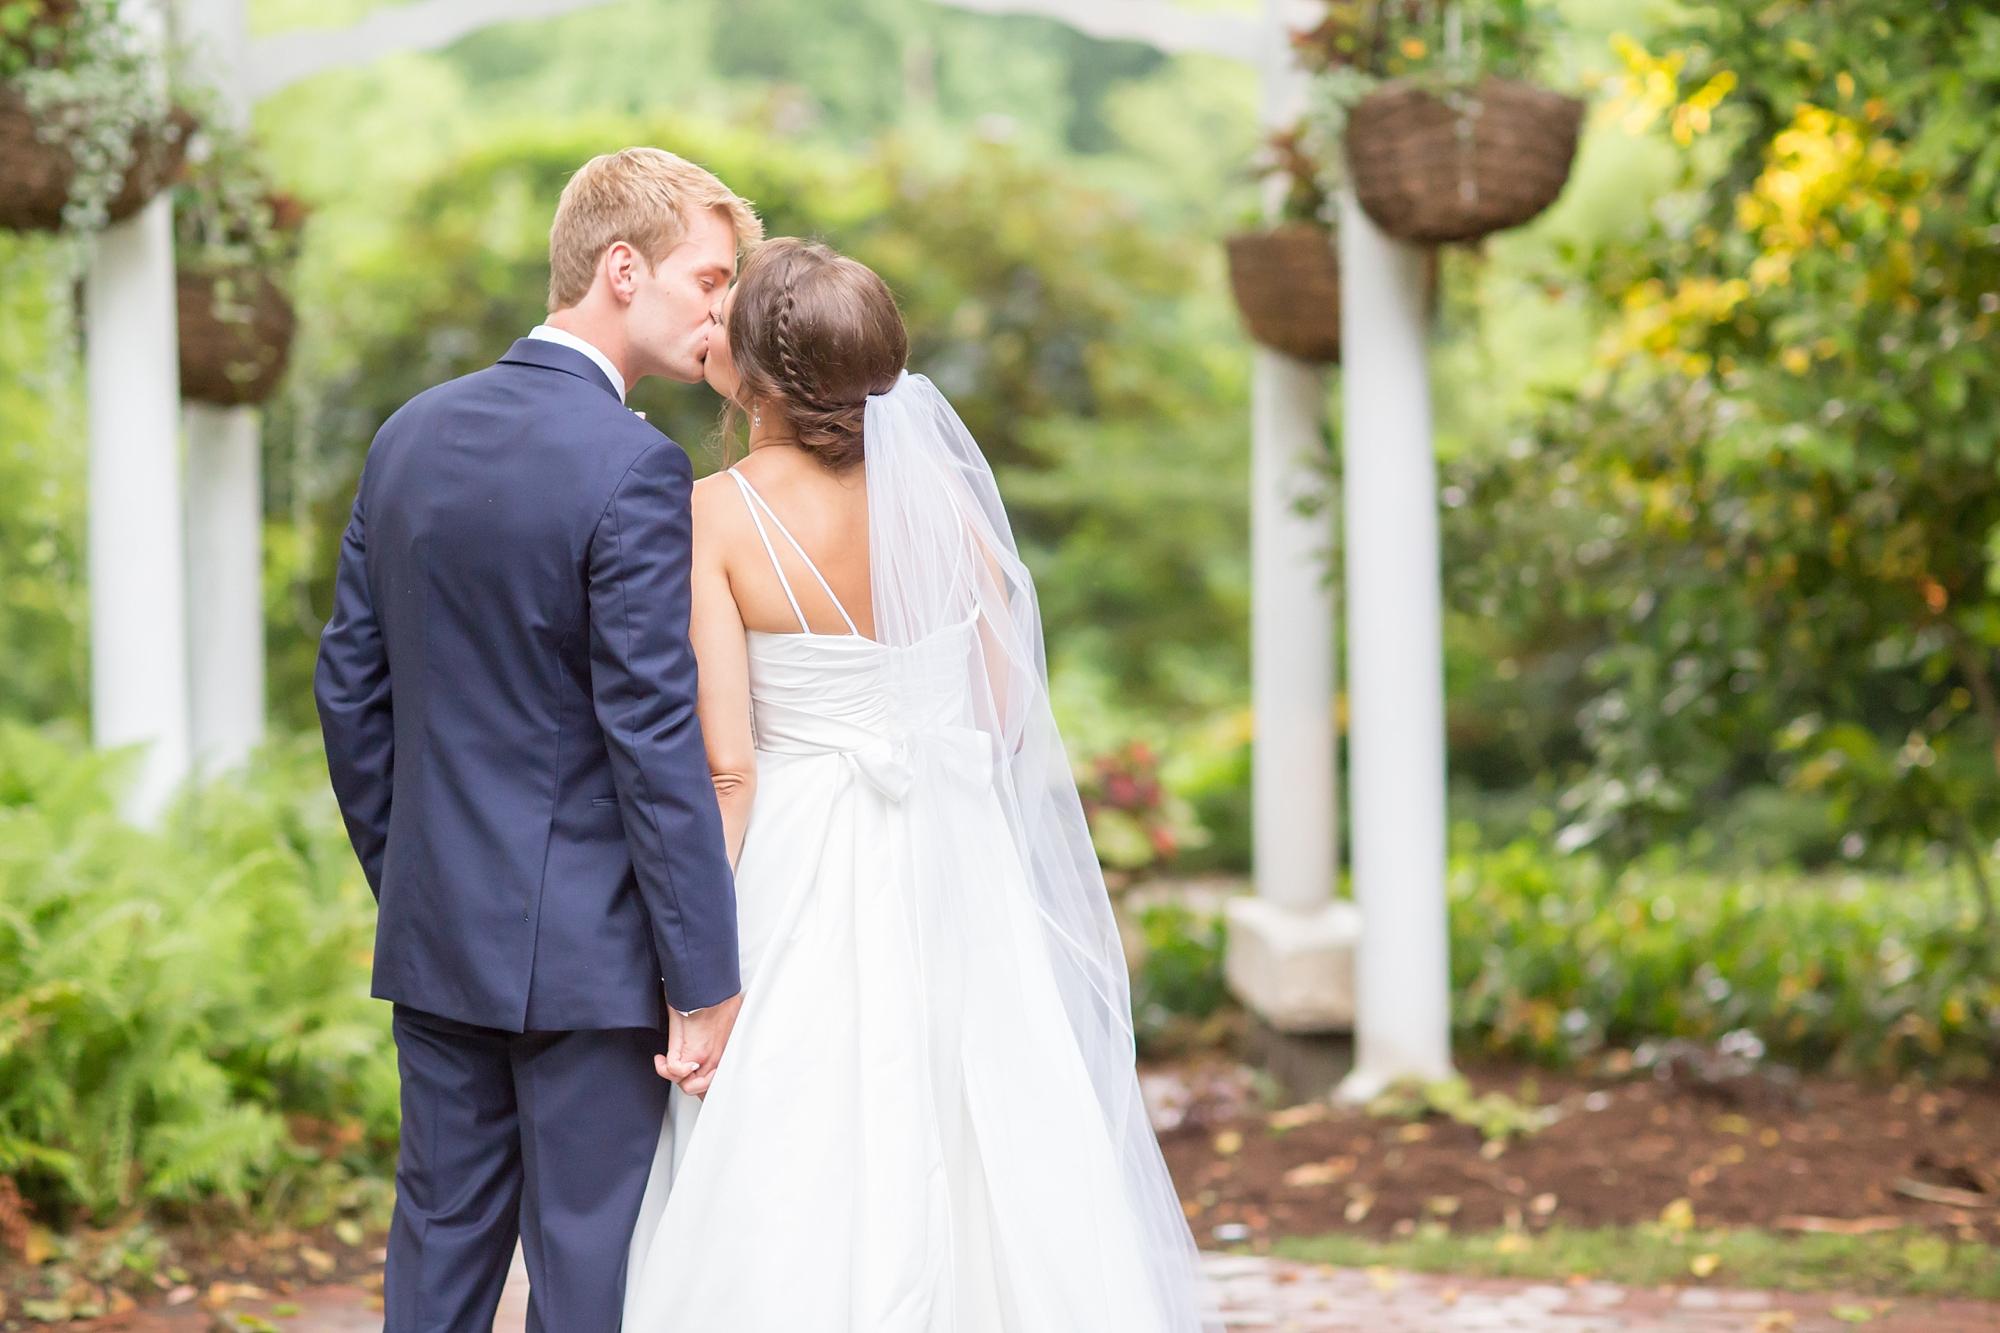 Russell 5-Bride & Groom Portraits-788_anna grace photography baltimore maryland wedding photographer elkridge furnace inn wedding photo.jpg